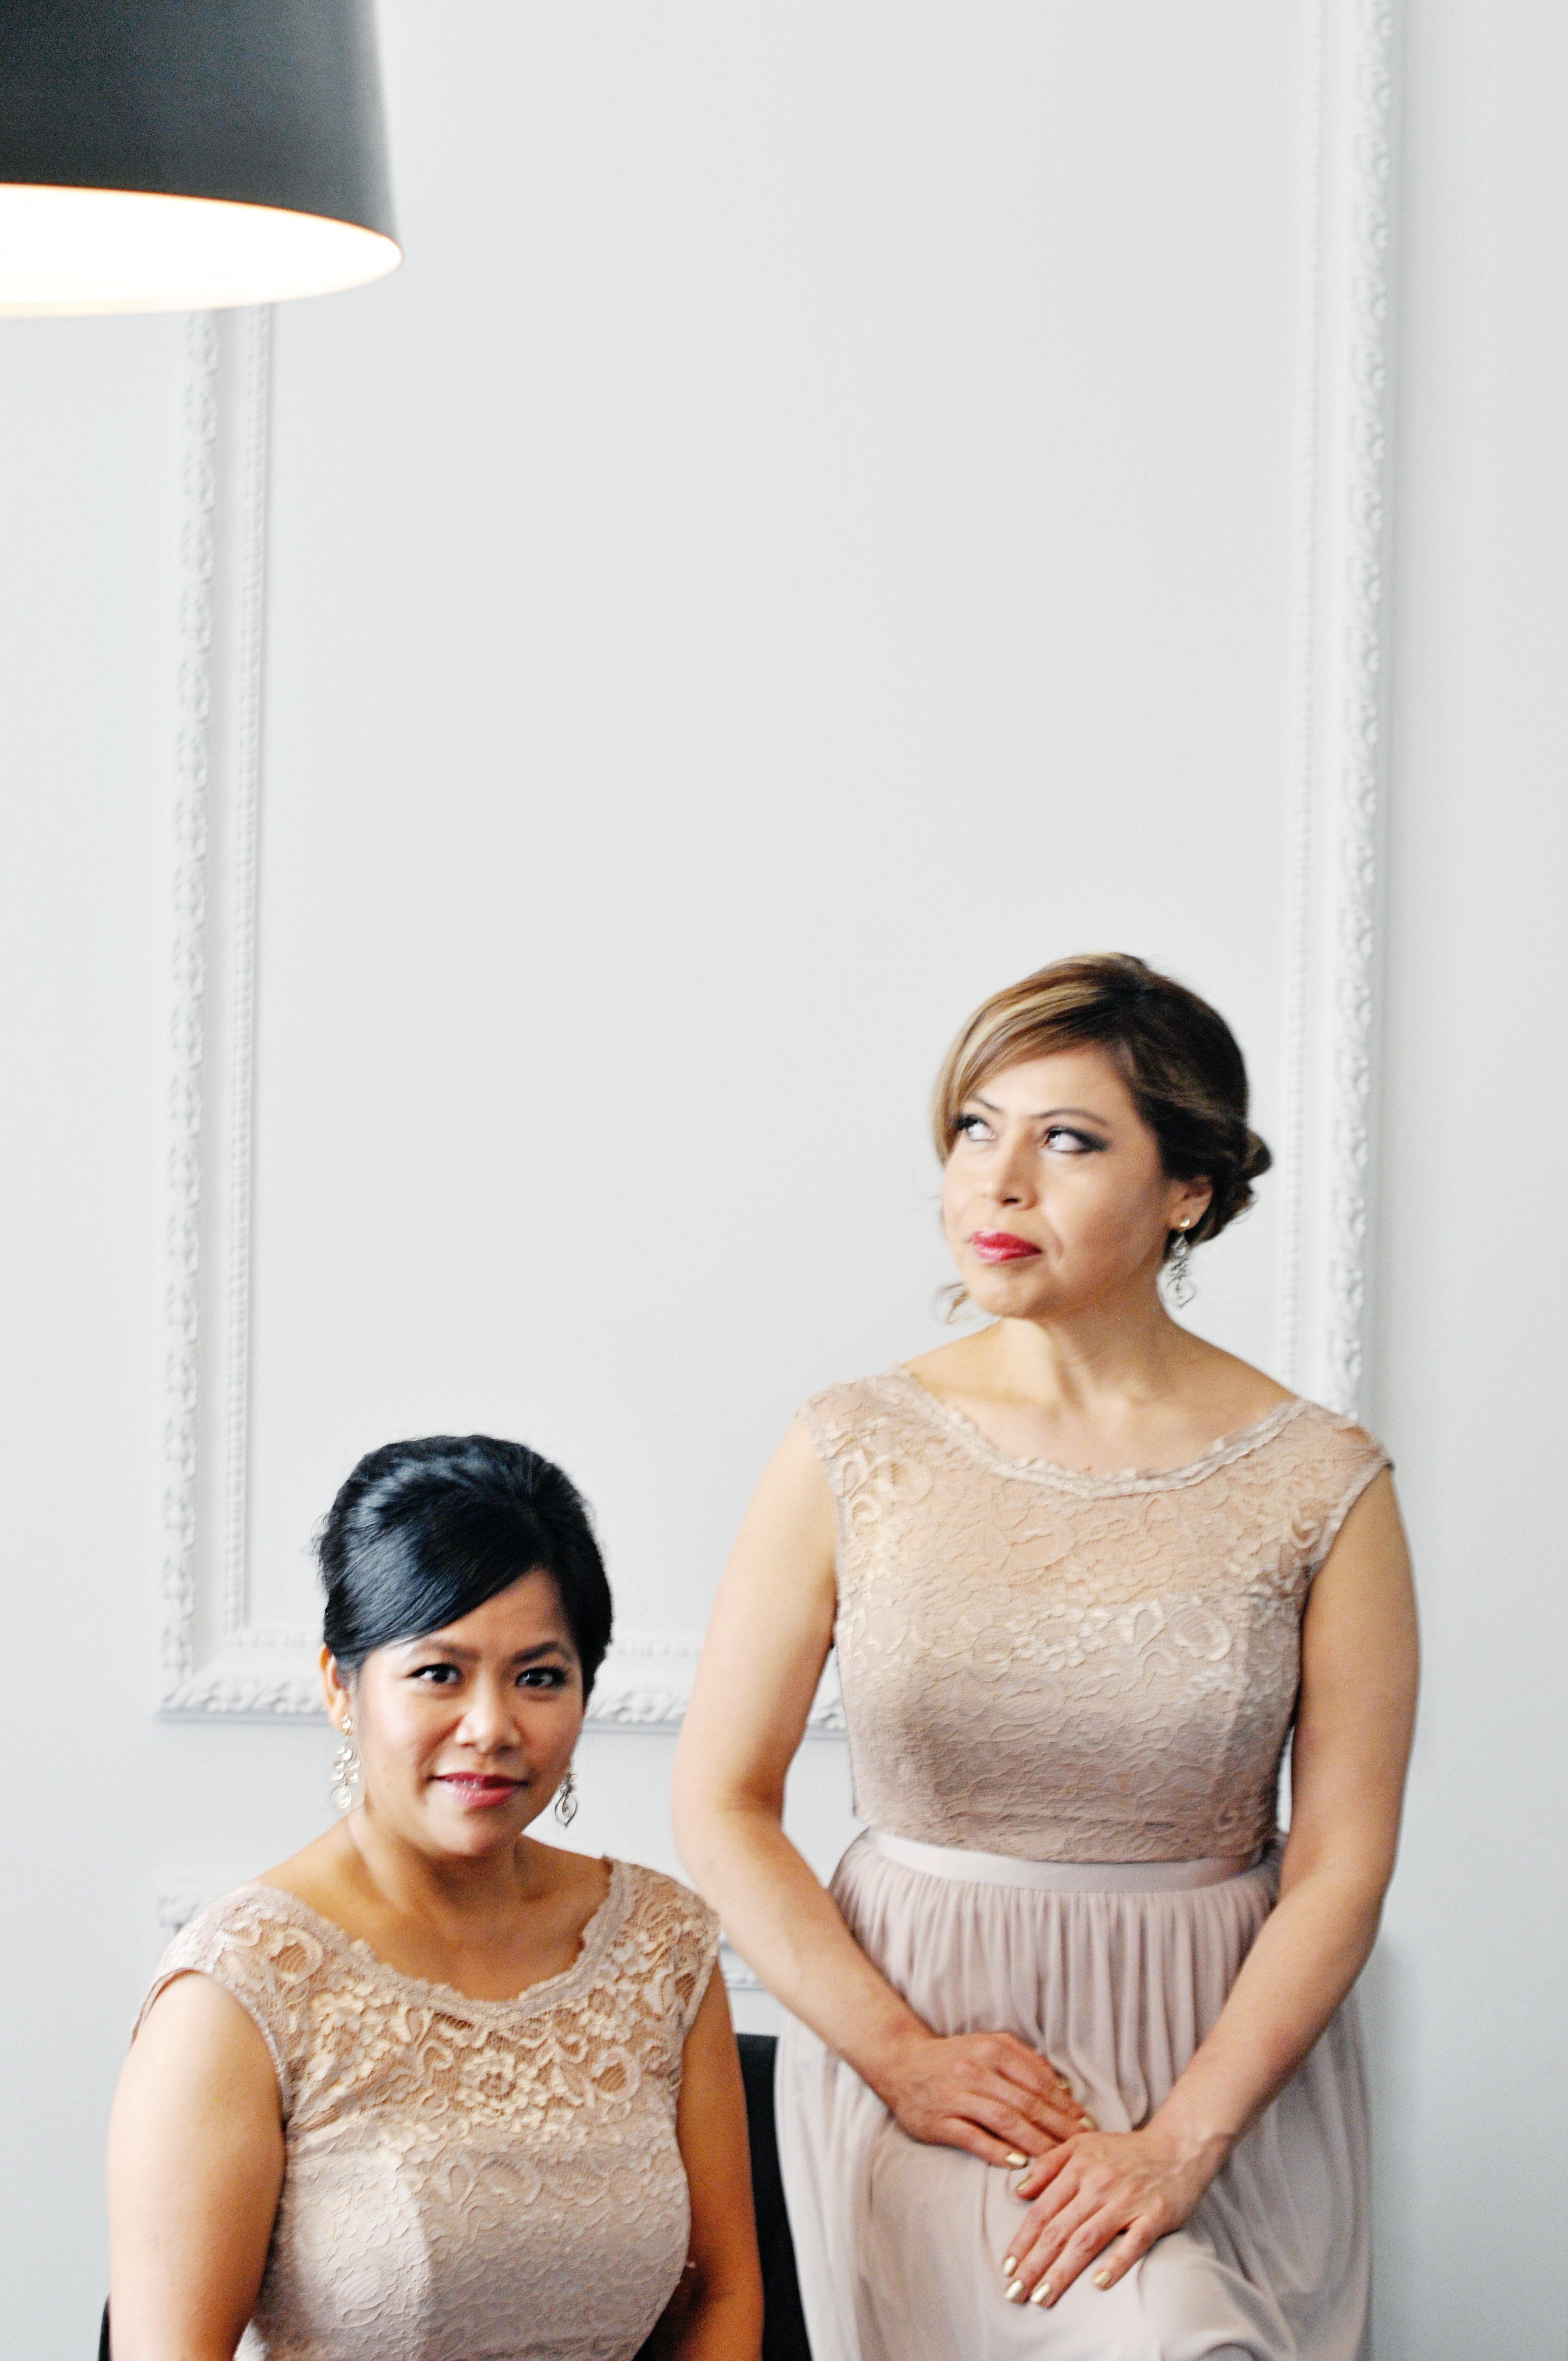 Partovi Wedding 2235 by maria pablo.jpg